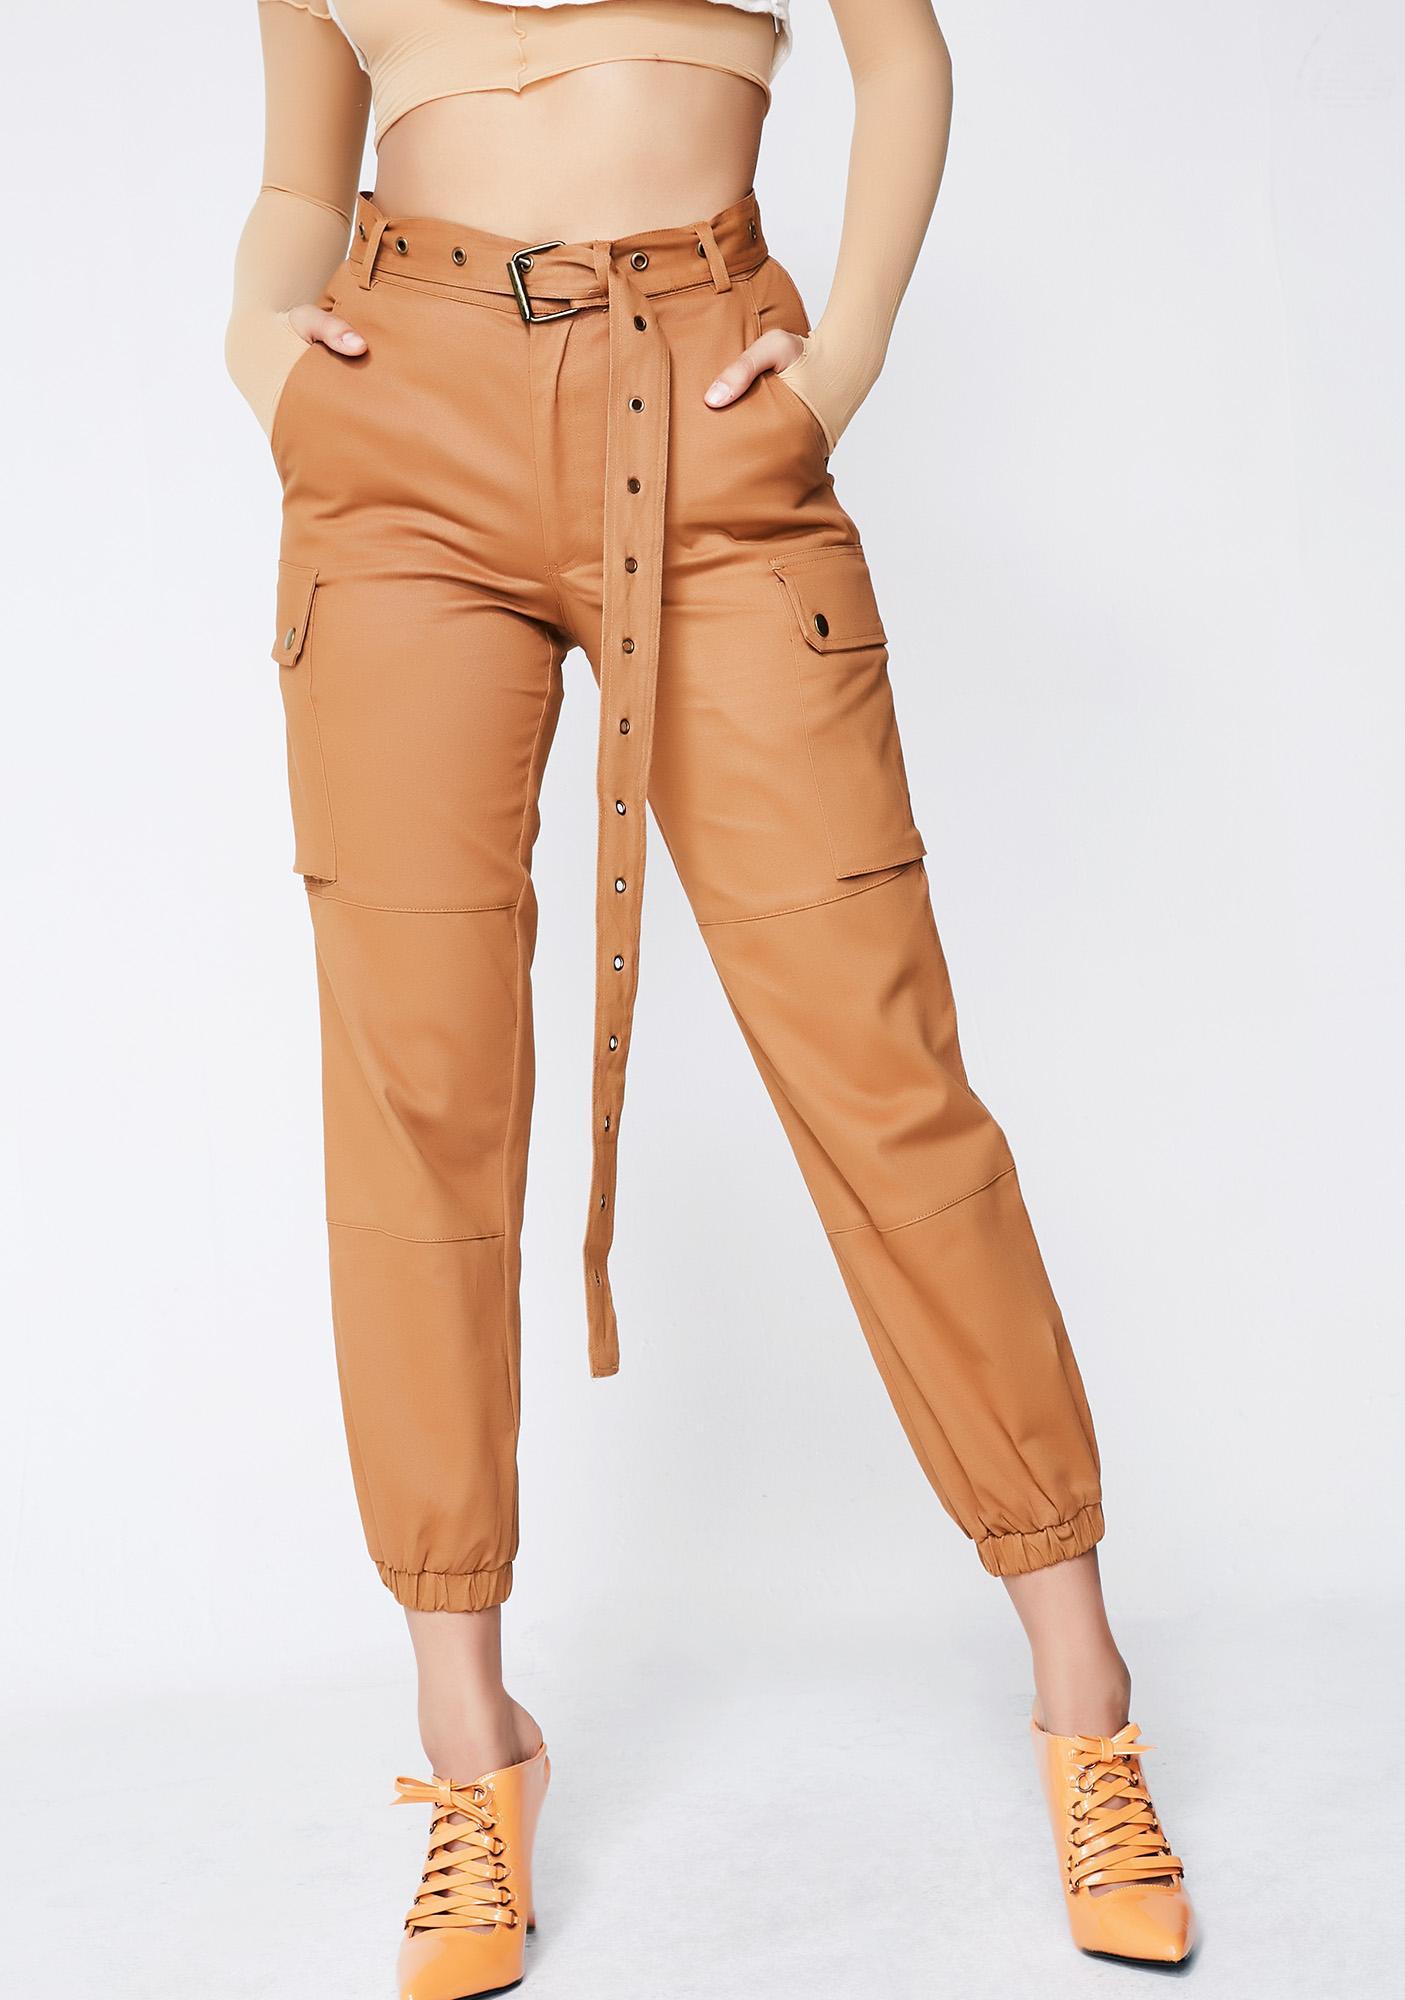 Junglist Cargo Pants